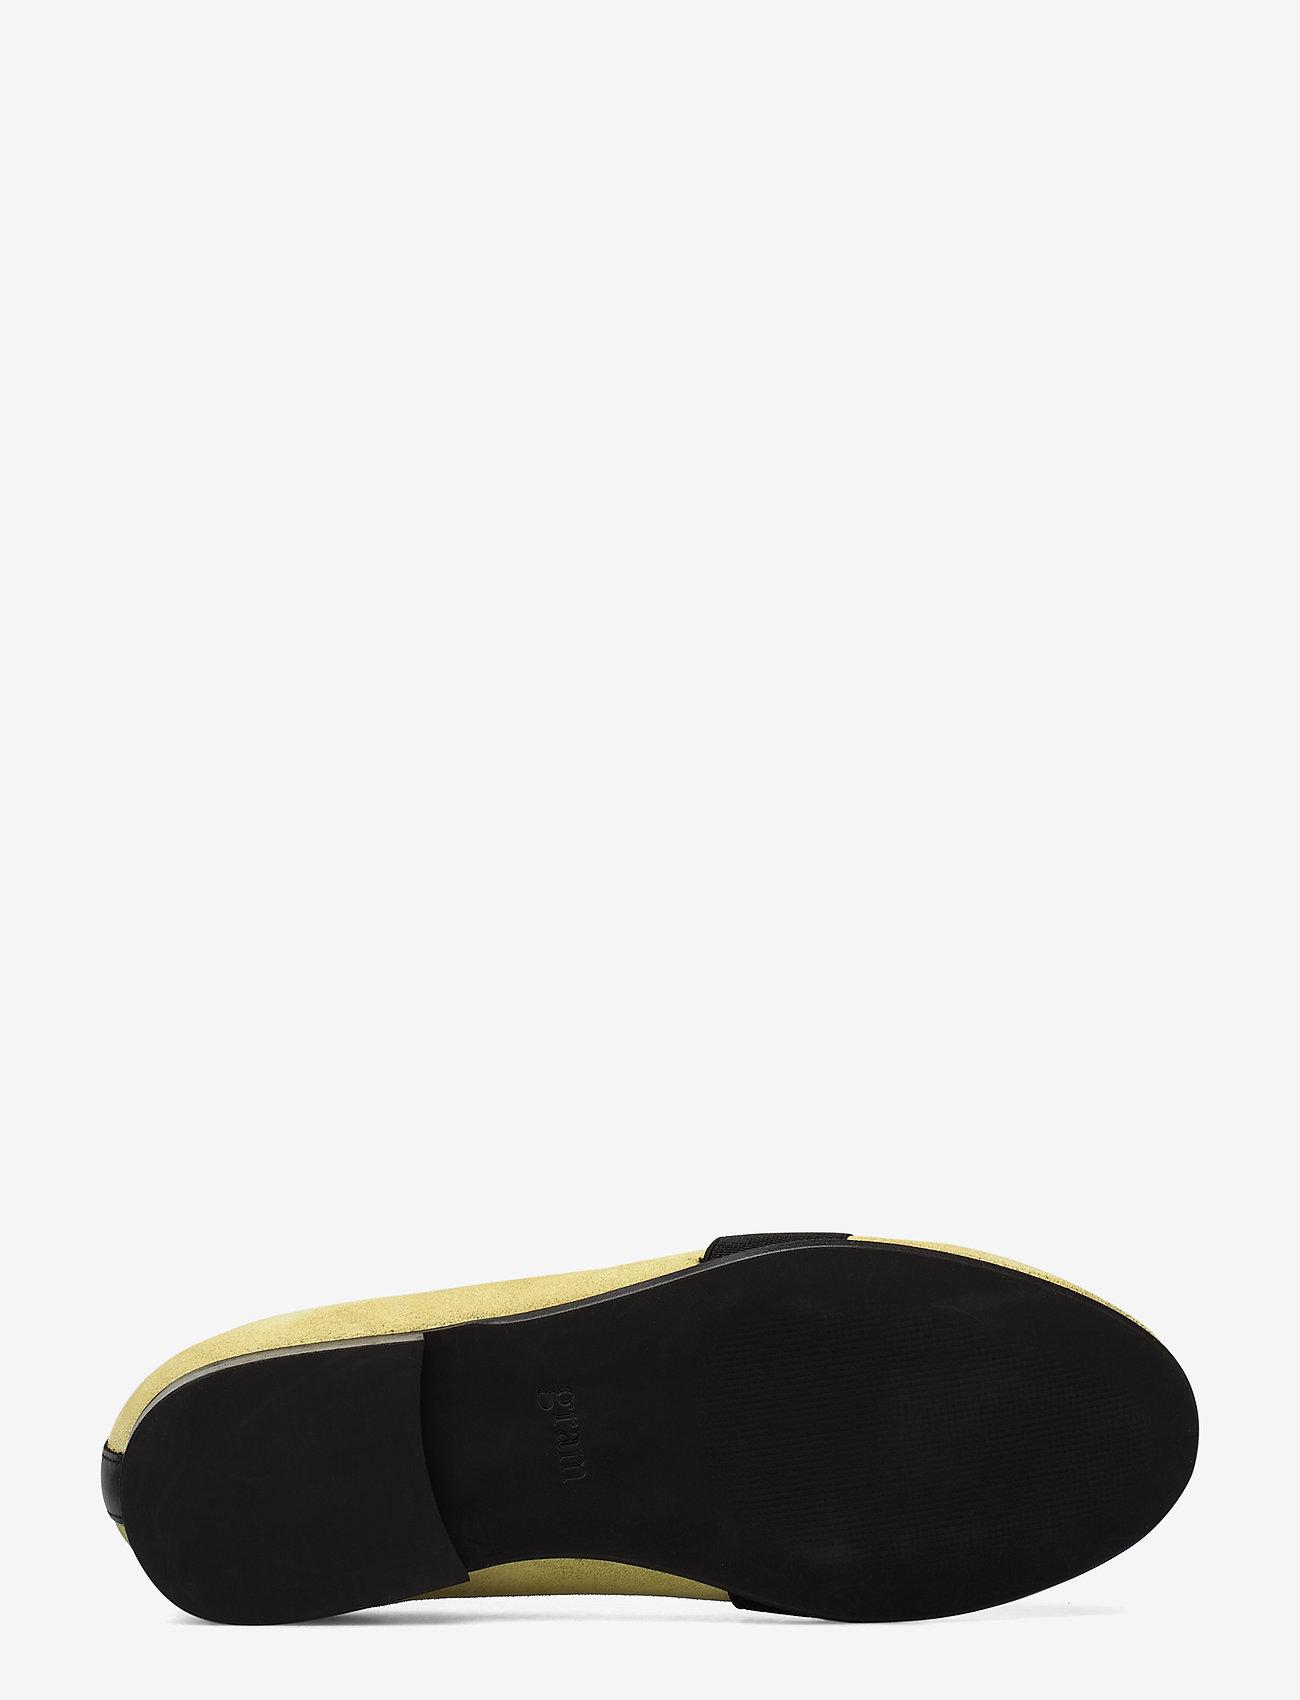 Yatfai Ballerina Bleached Corn (Bleached Corn) - Gram 6uE4RQ